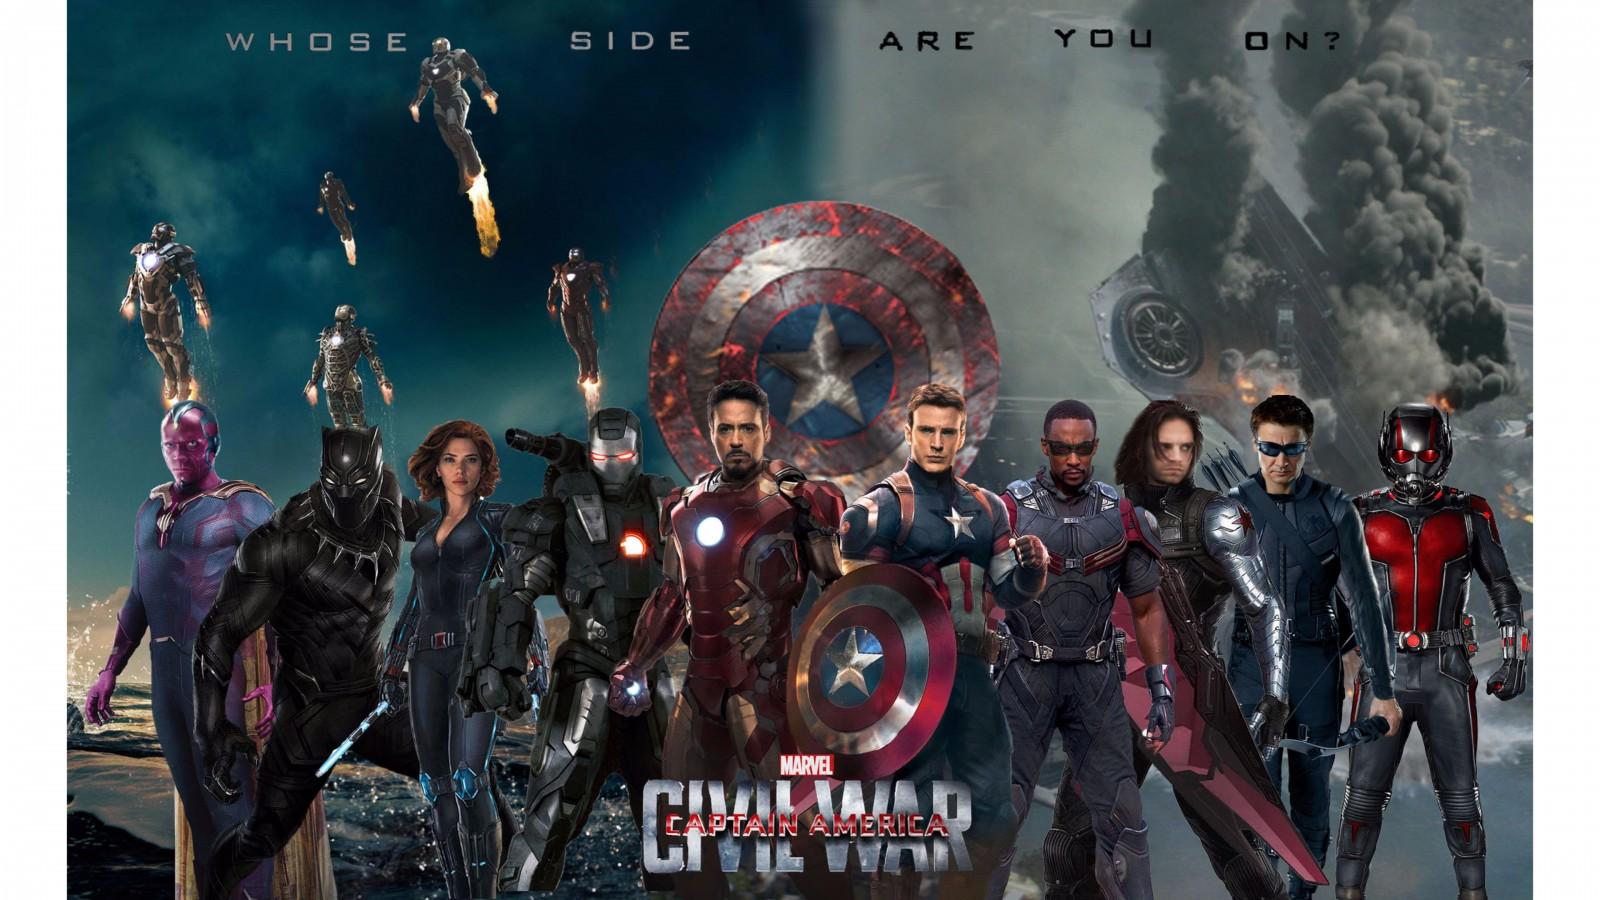 2016 Captain America Civil War 4K Wallpaper 4K Wallpaper 1600x900